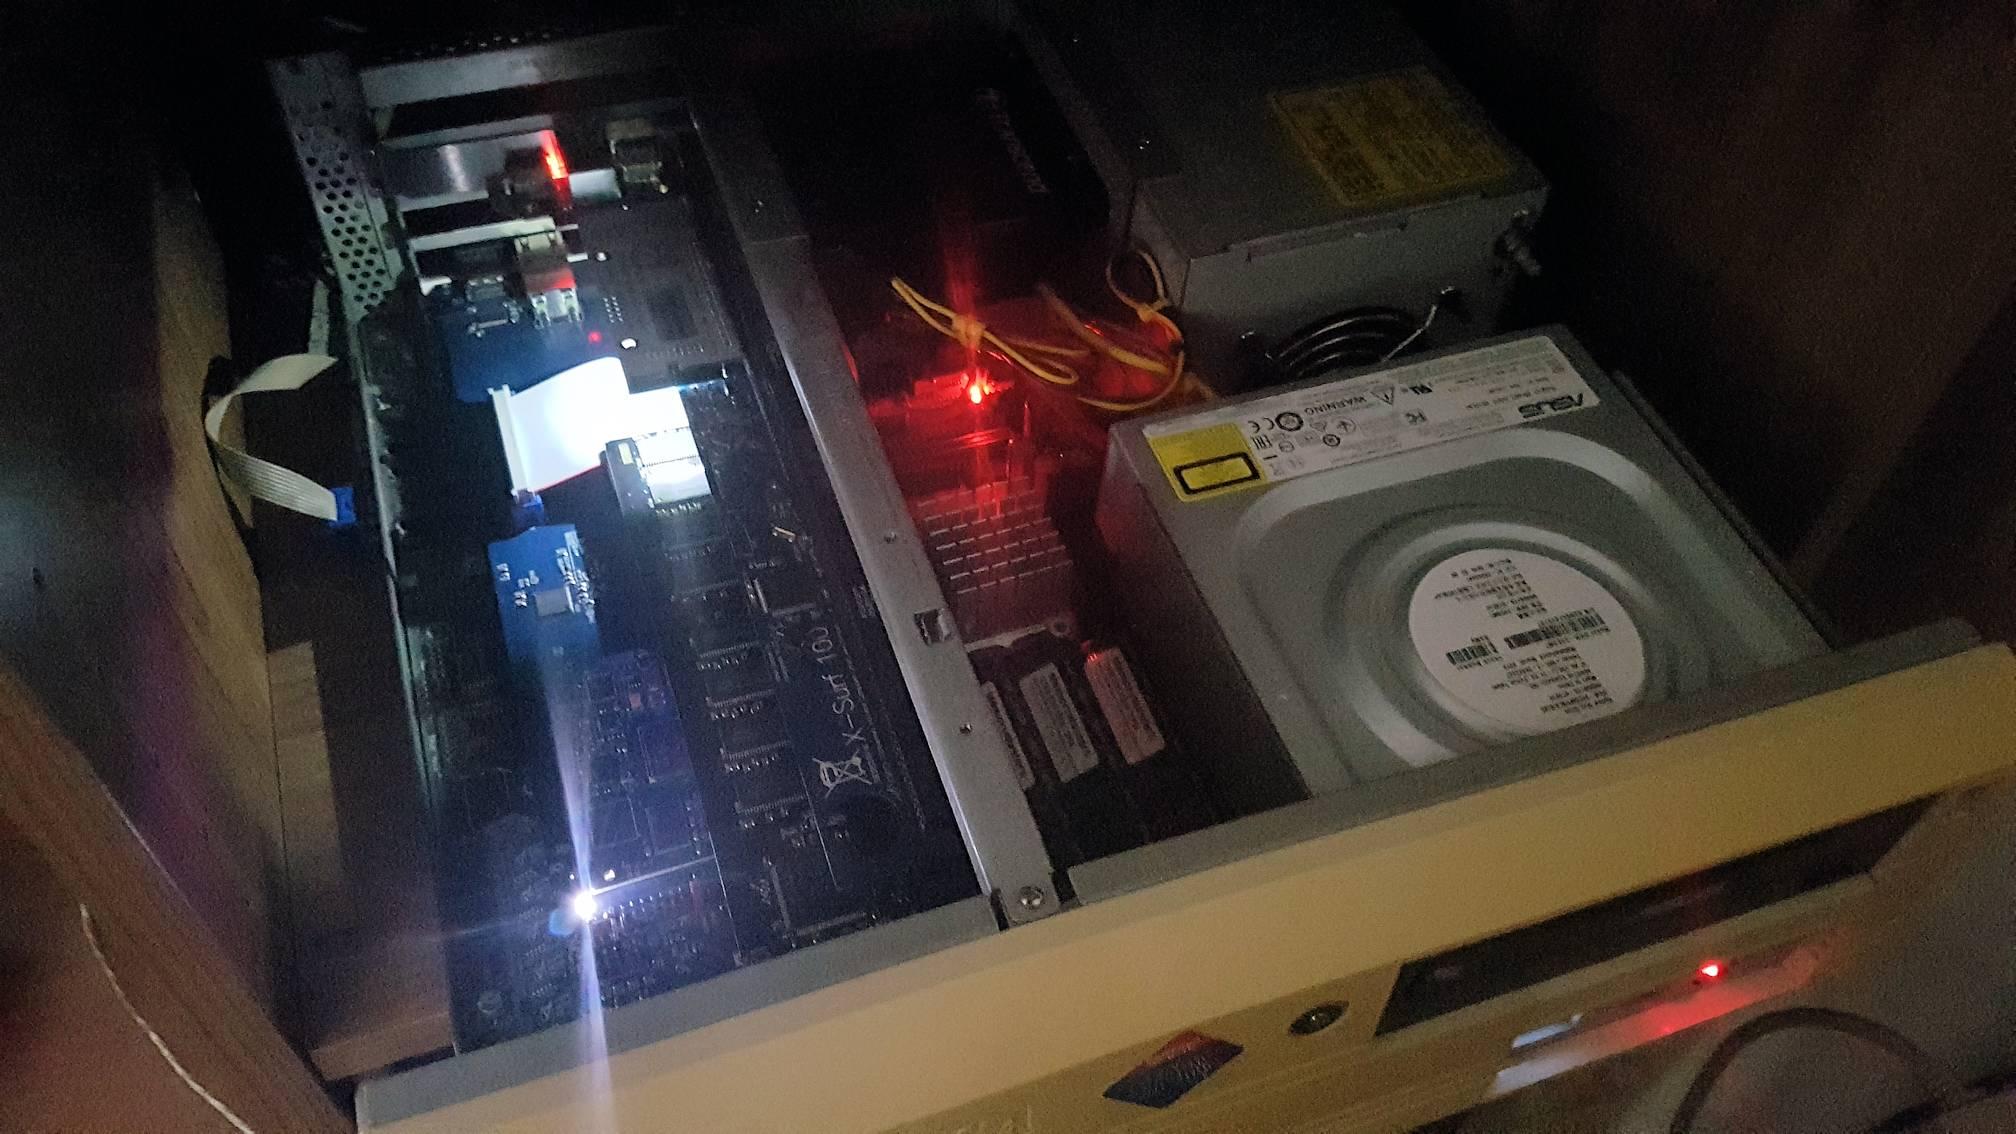 Amiga 4000 in funzione